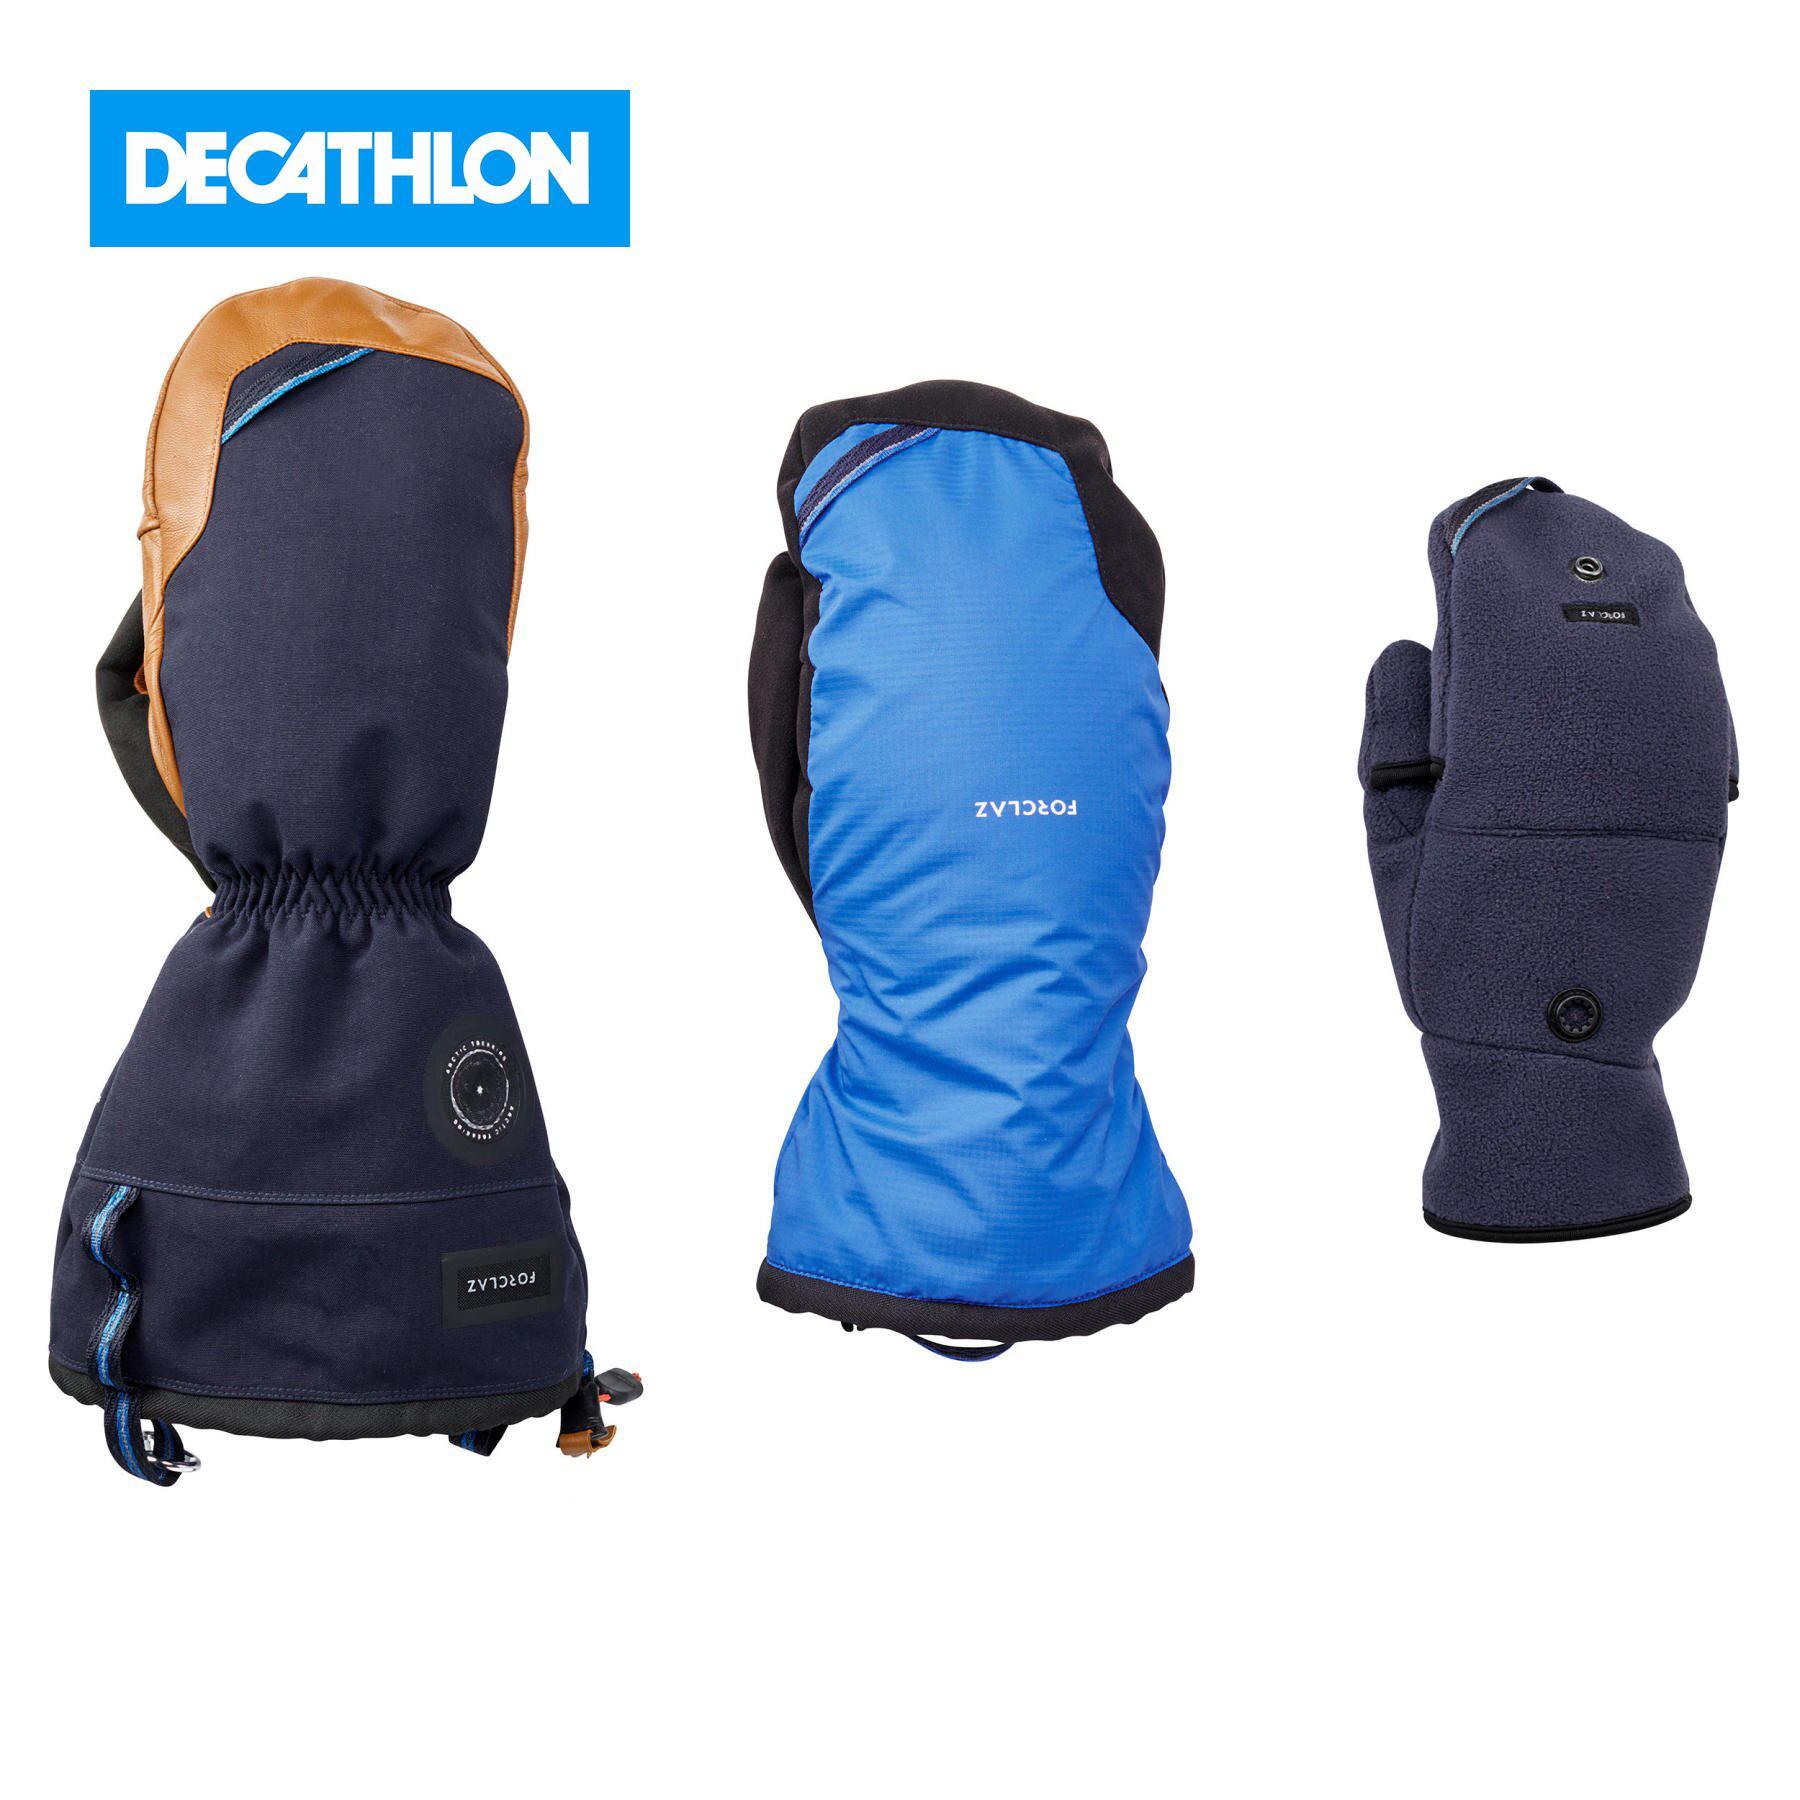 Варежки митенки для треккинга ARCTIC 500 FORCLAZ x Decathlon Перчатки для походов      АлиЭкспресс